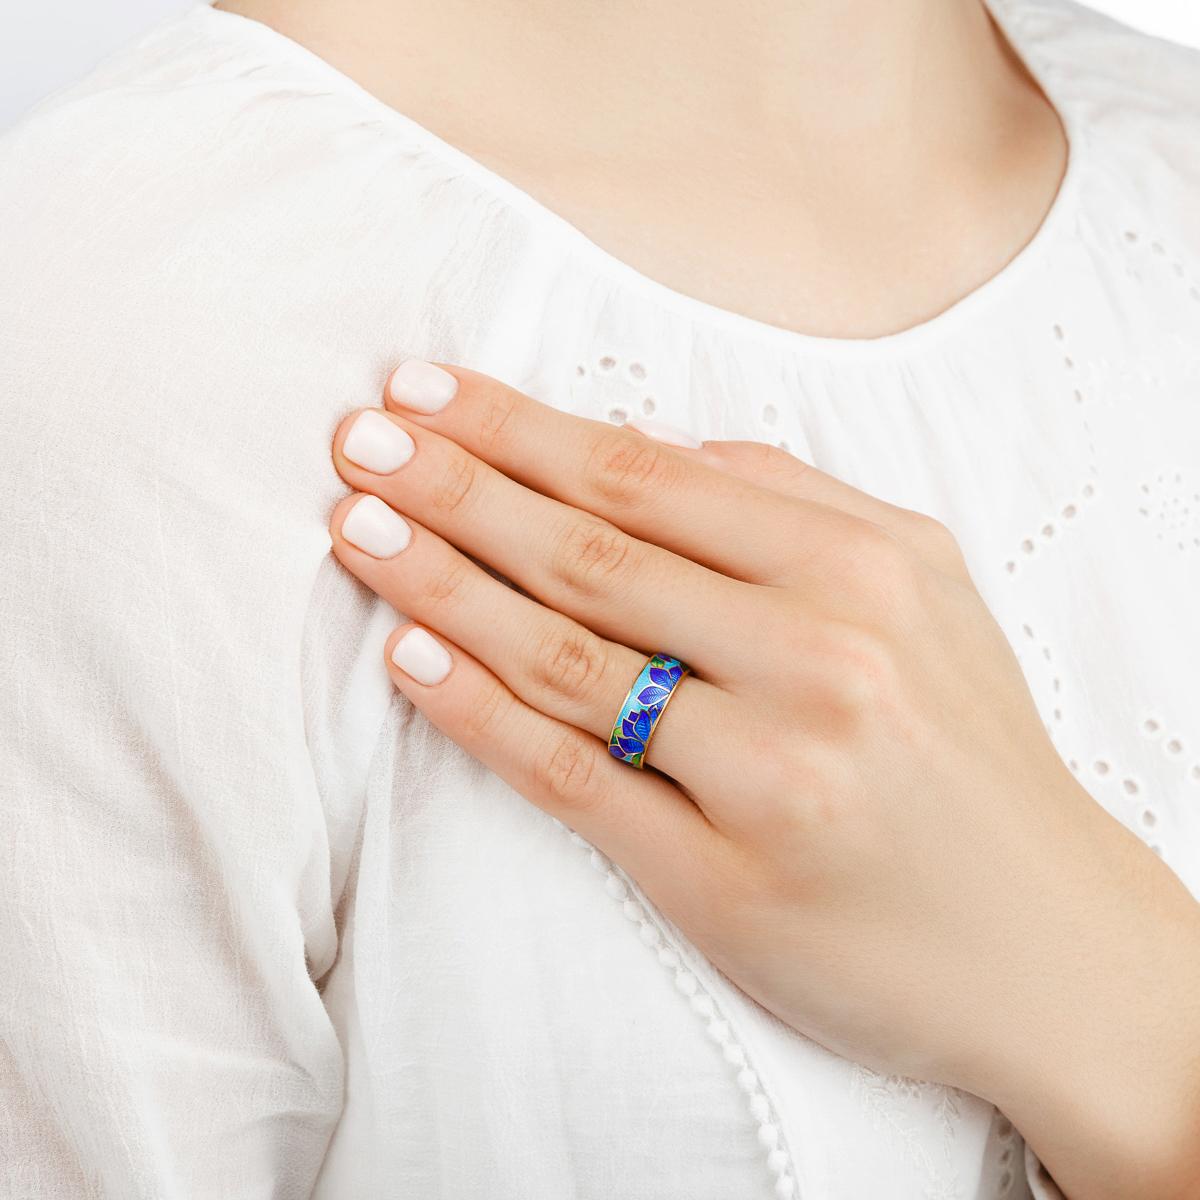 klematis zolochenie sine goluboe - Кольцо из серебра «Клематис» (золочение), сине-голубое